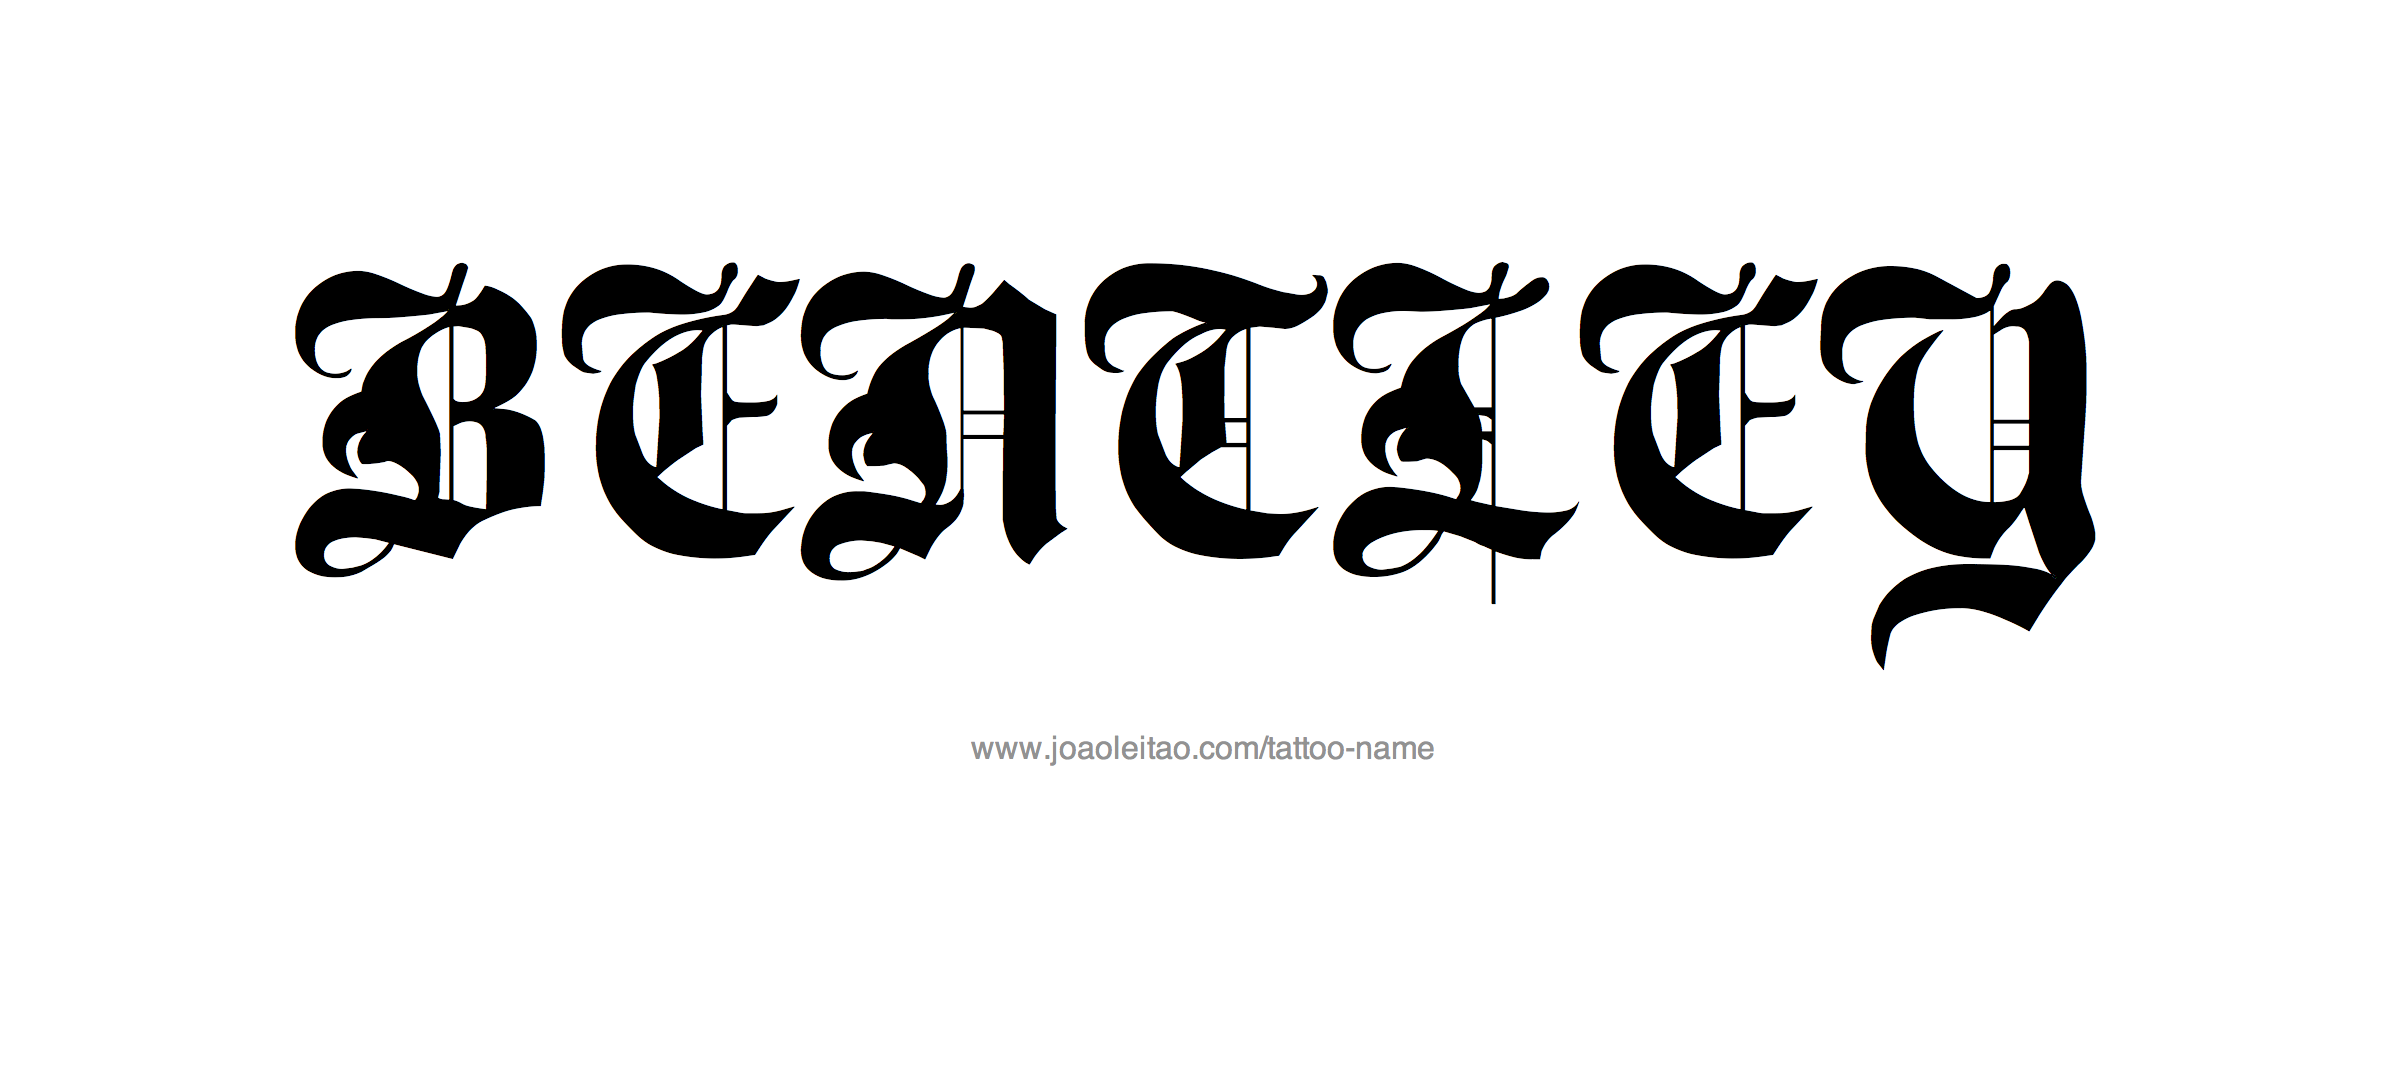 15 Bentley Tattoo Designs